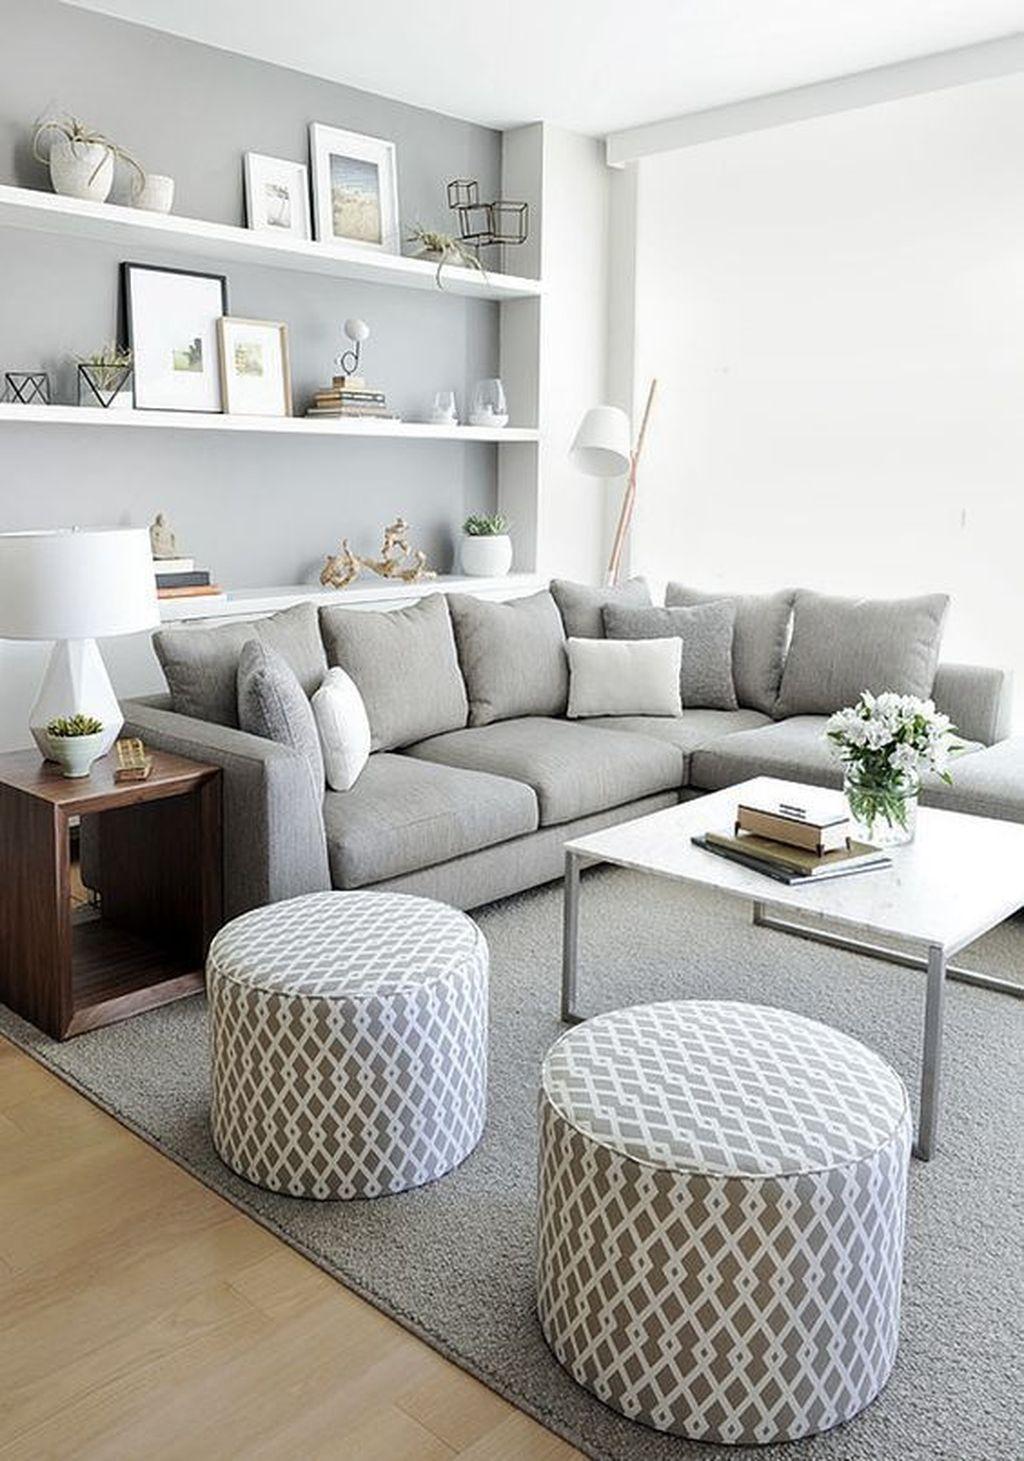 Brilliant Small Apartment Decoration Ideas On A Budget 31